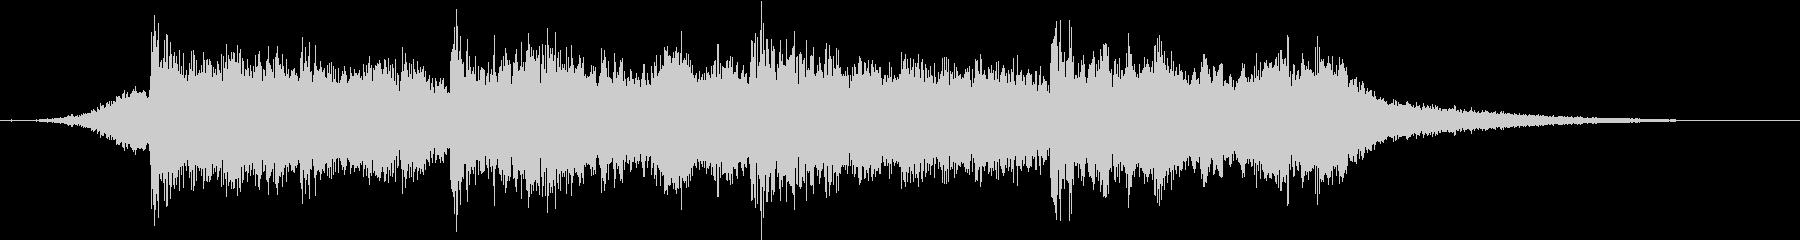 Cinematic Piano&Strings 2の未再生の波形